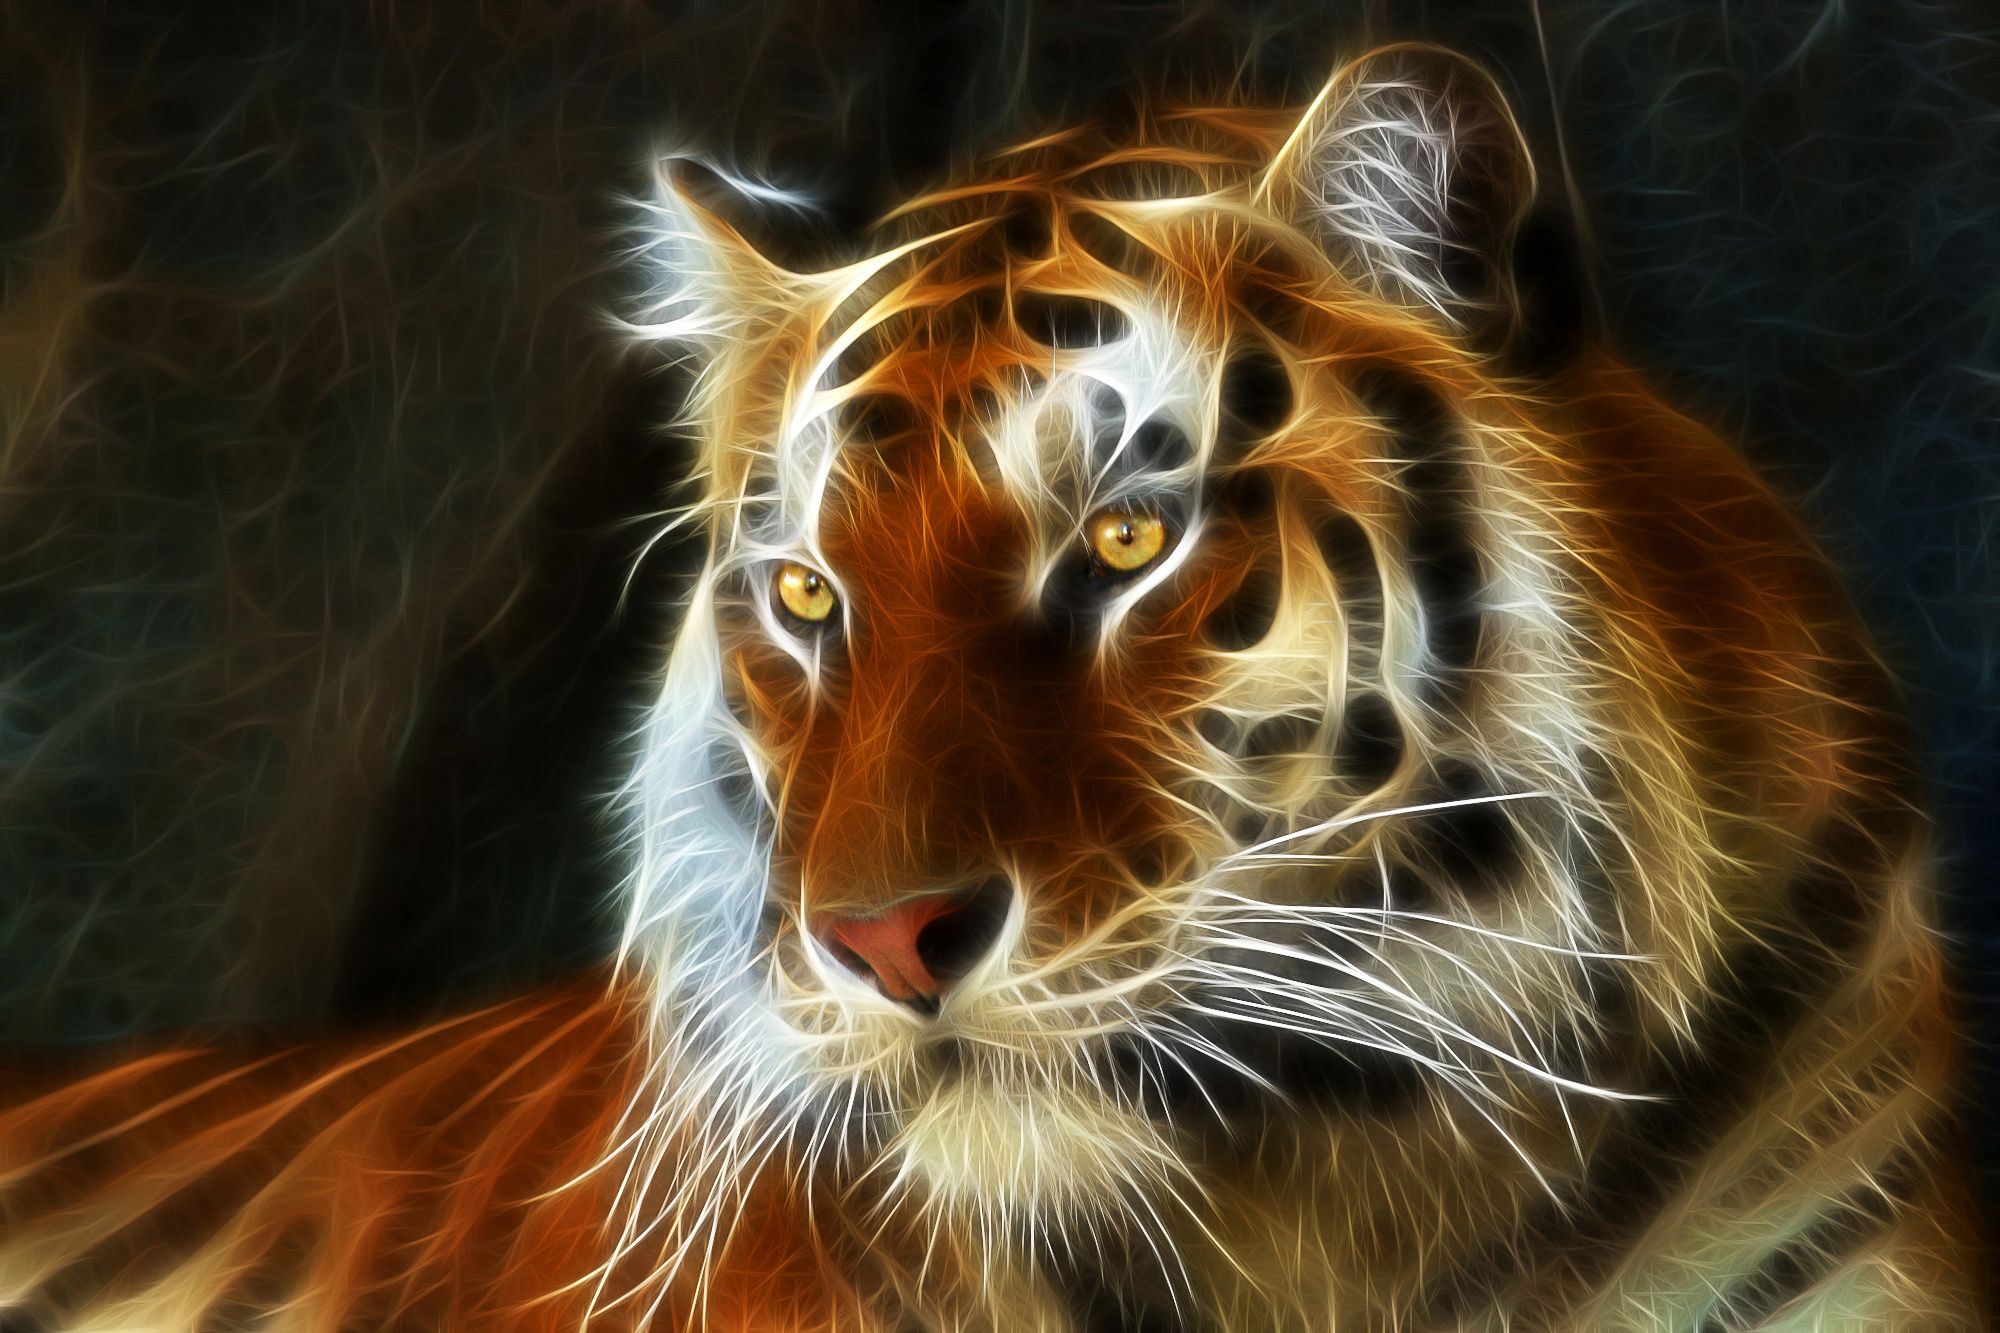 Tiger Images 3d Tiger pictures